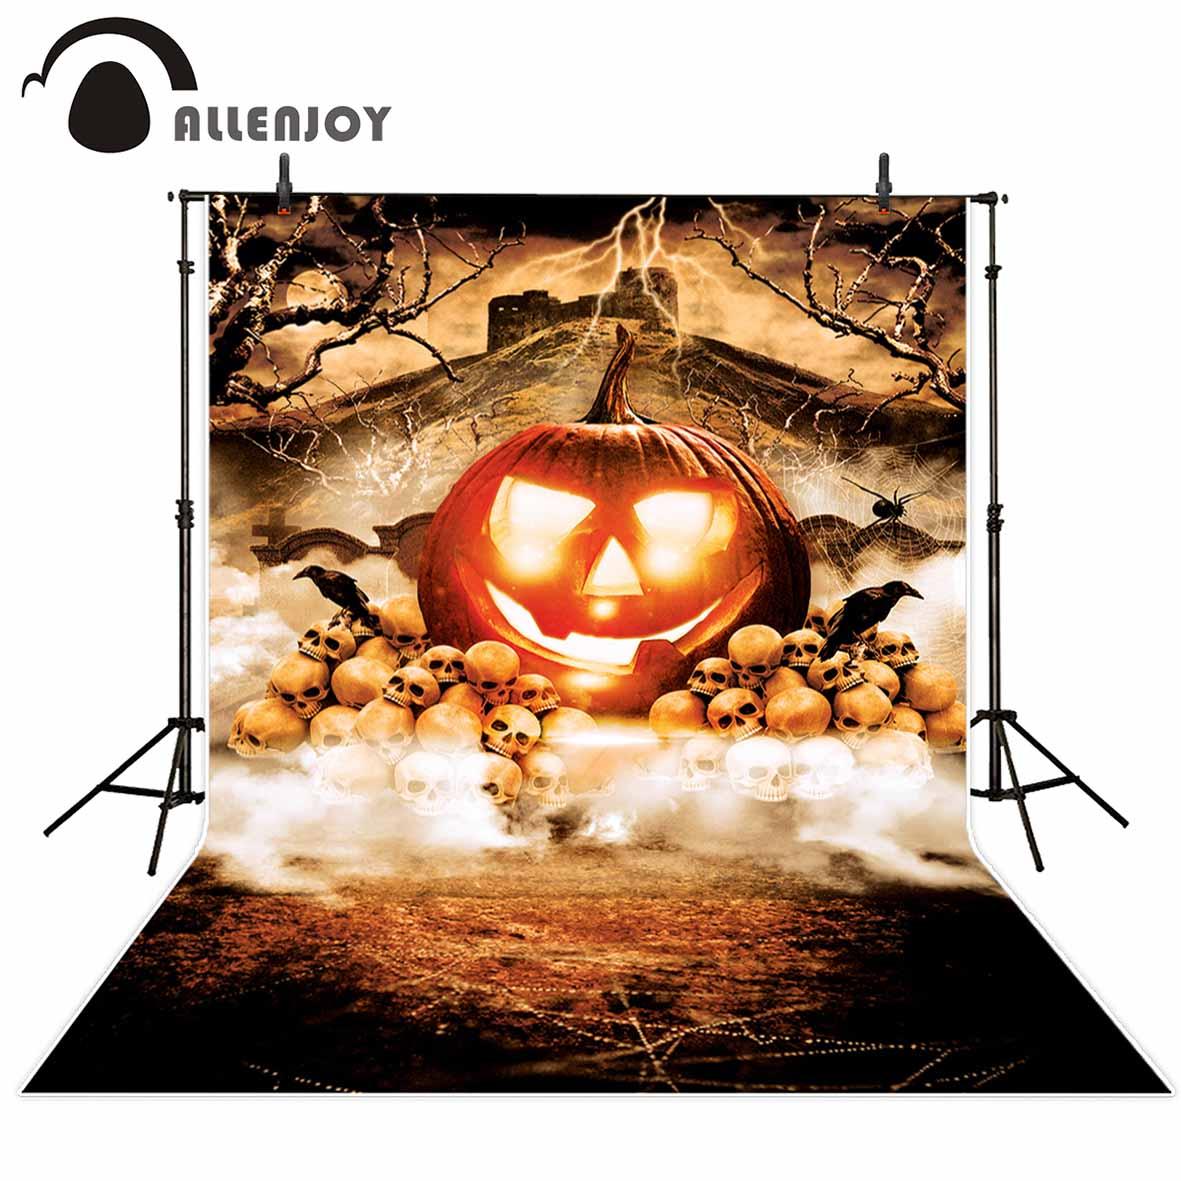 Allenjoy photography backdrop Doomsday Spider Skull Head Pumpkin Halloween backdrop newborn original design fantasy studio props футболка print bar doomsday